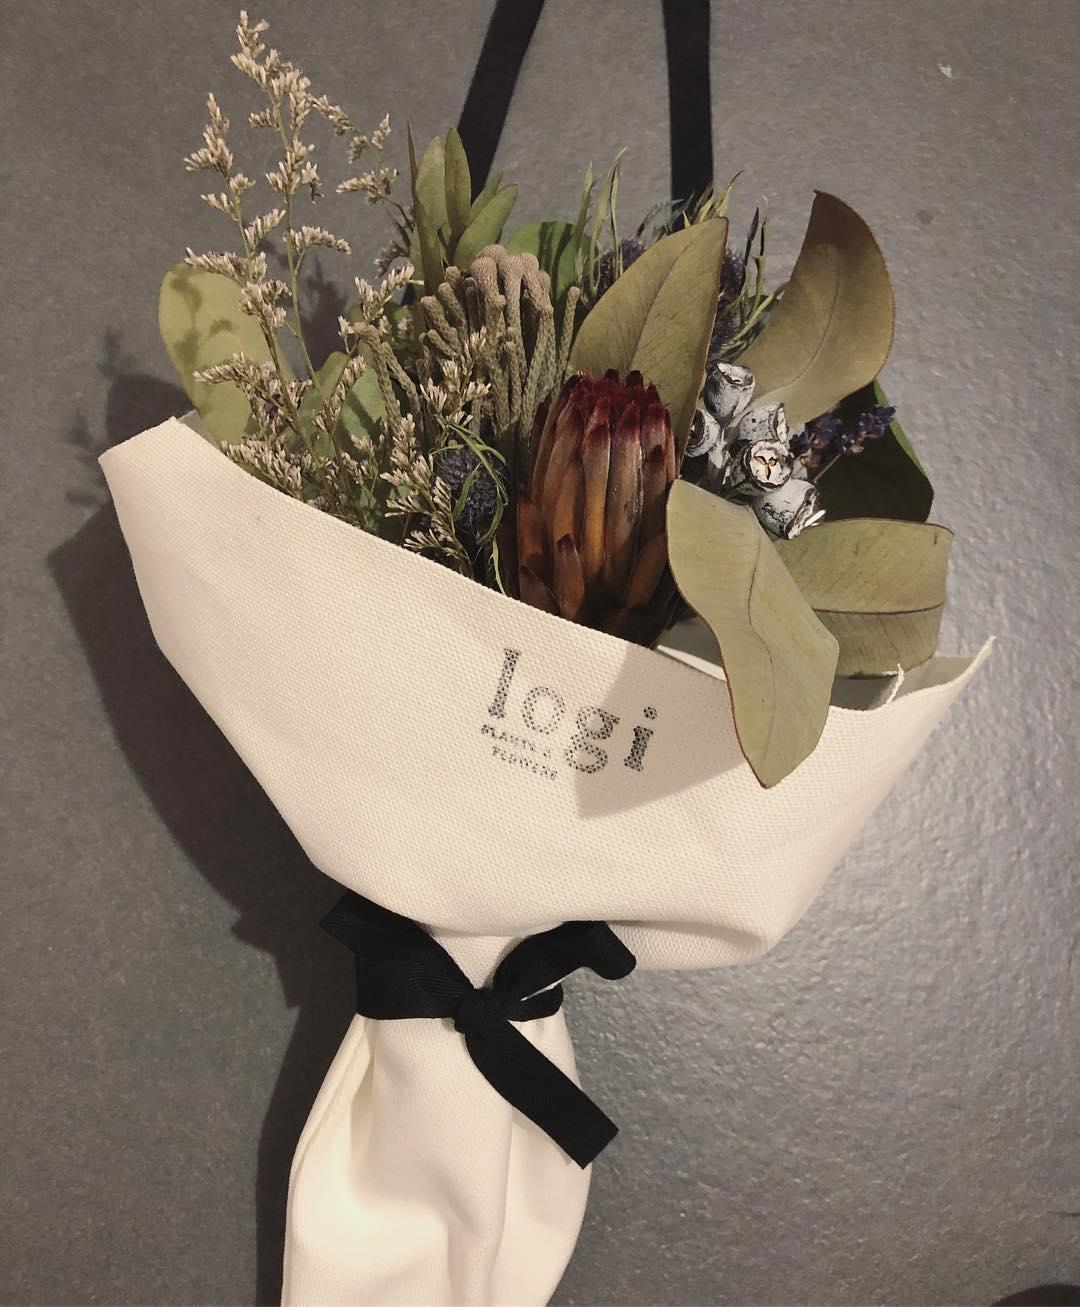 5_logi PLANTS & FLOWERS